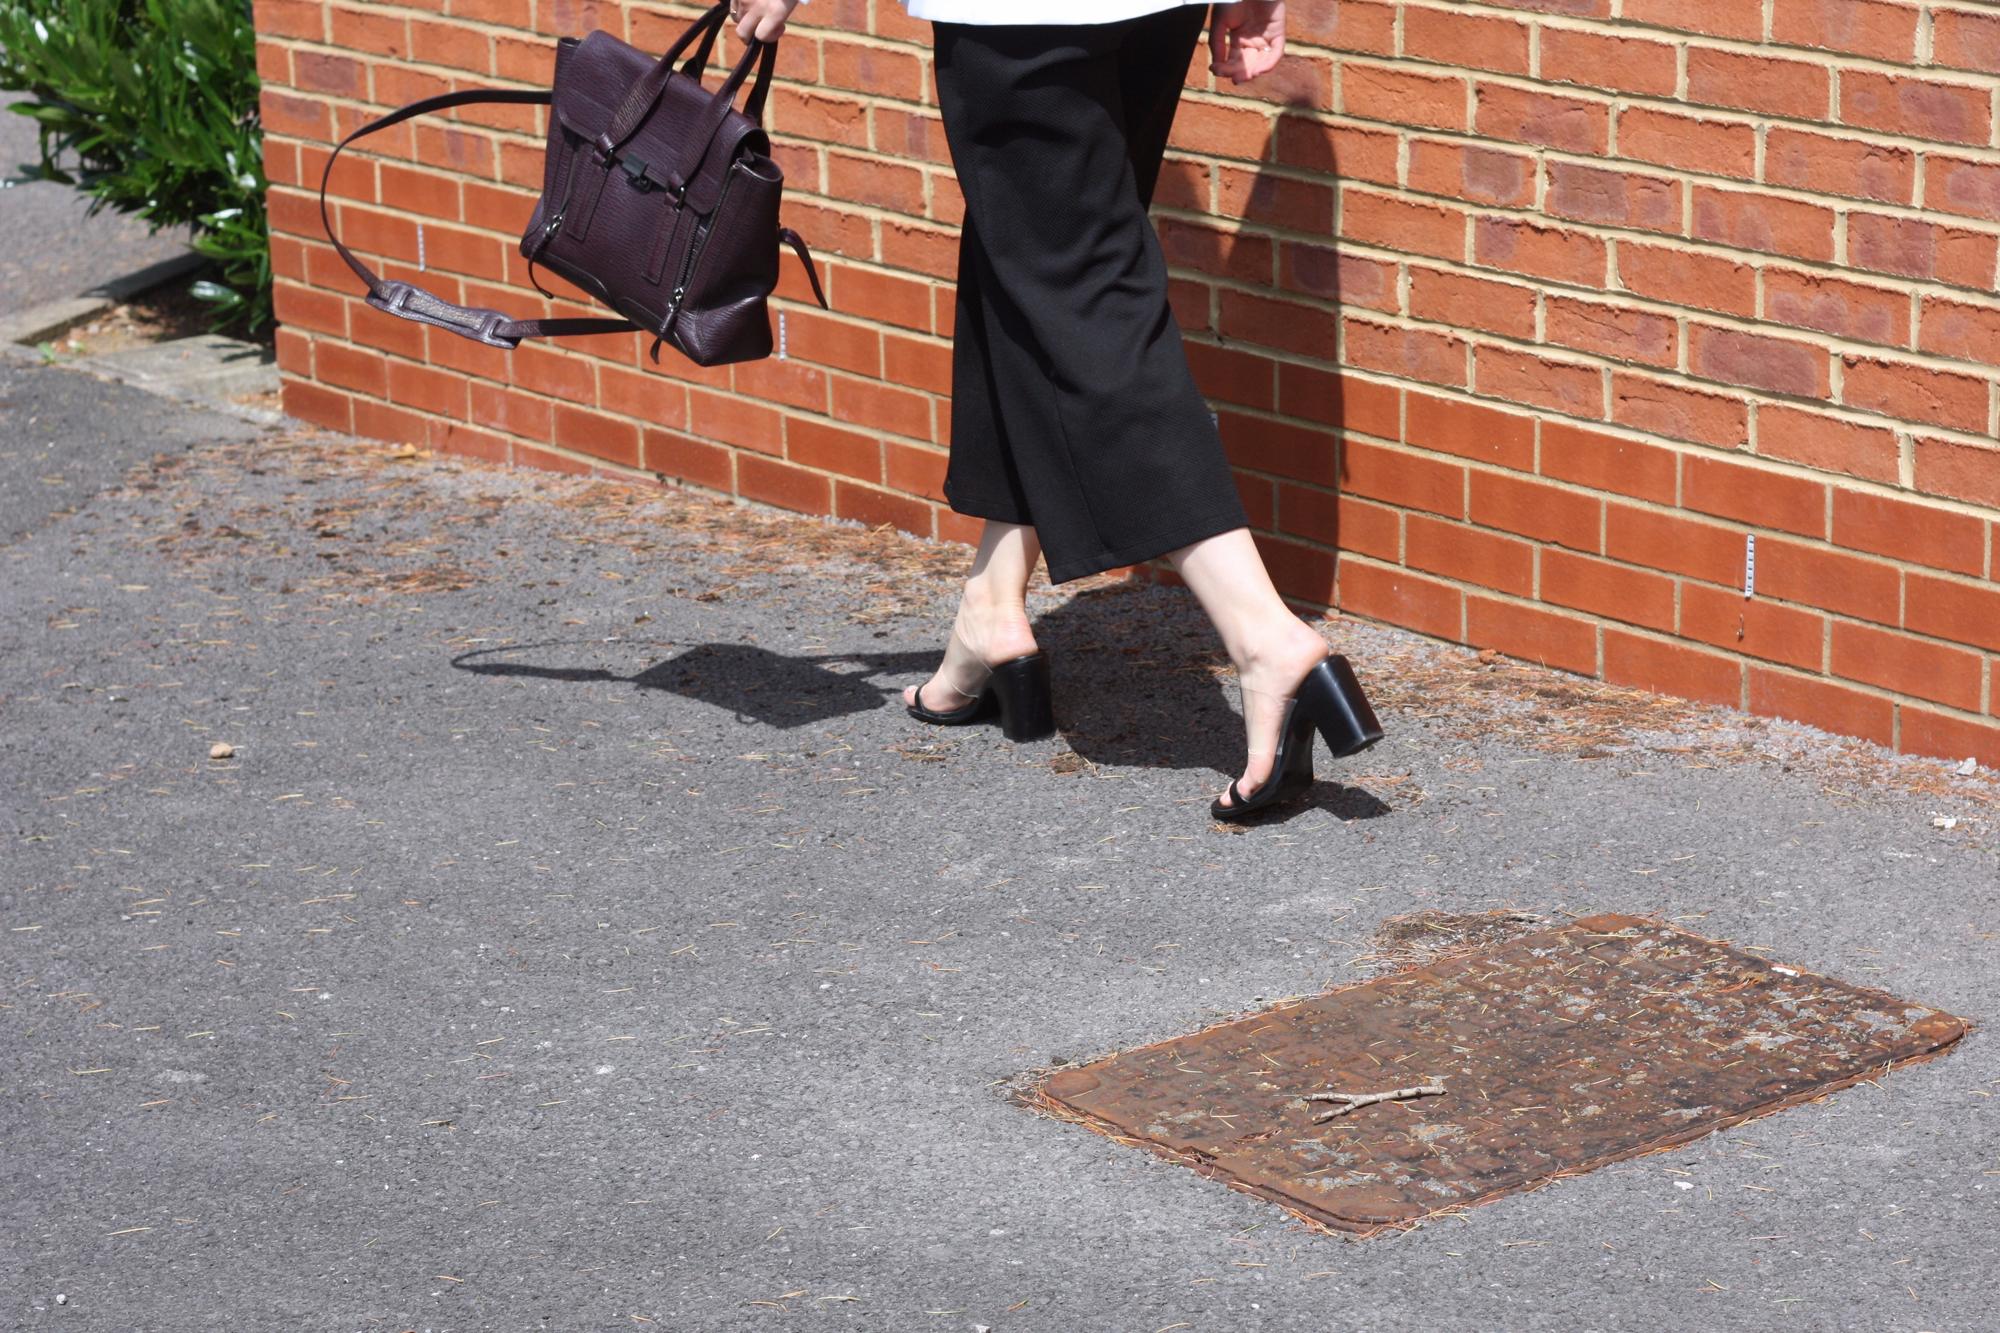 Mango see-through straps sandals, Zara black jumpsuit and 3.1 Phillip Lim Pashli medium bag